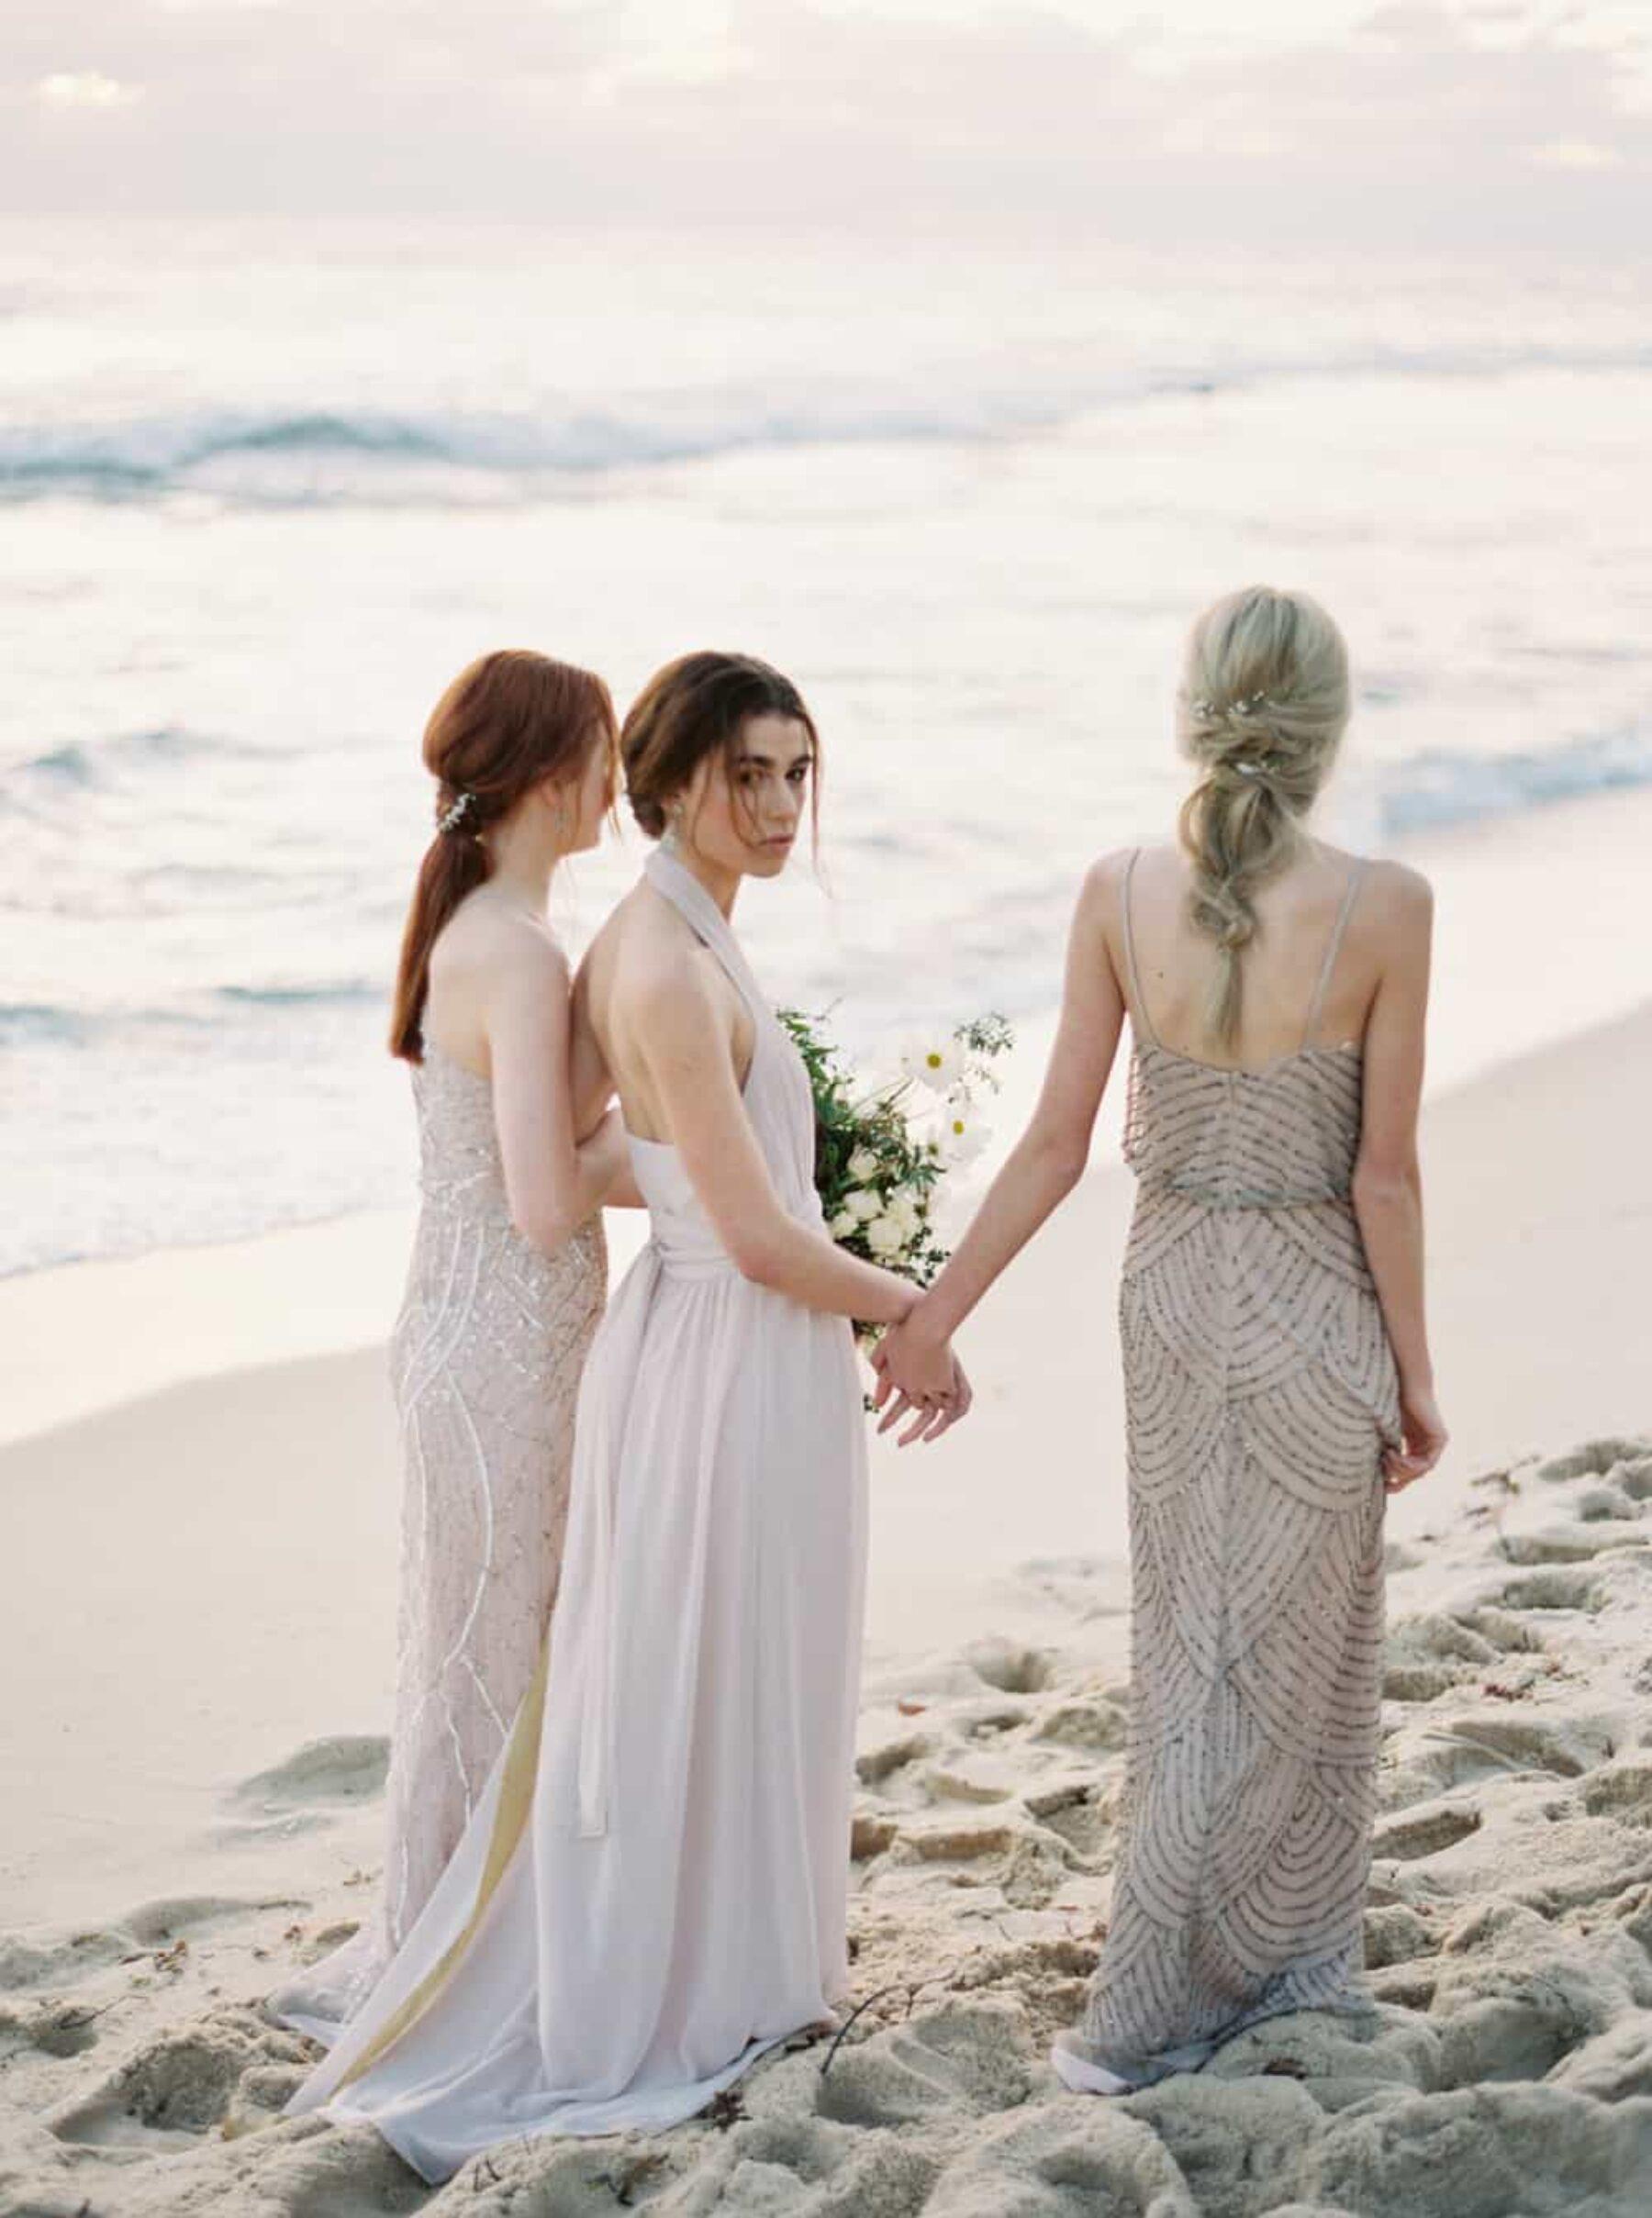 Bridesmaid dresses from Babushka Ballerina/ Photography by Katie Grant